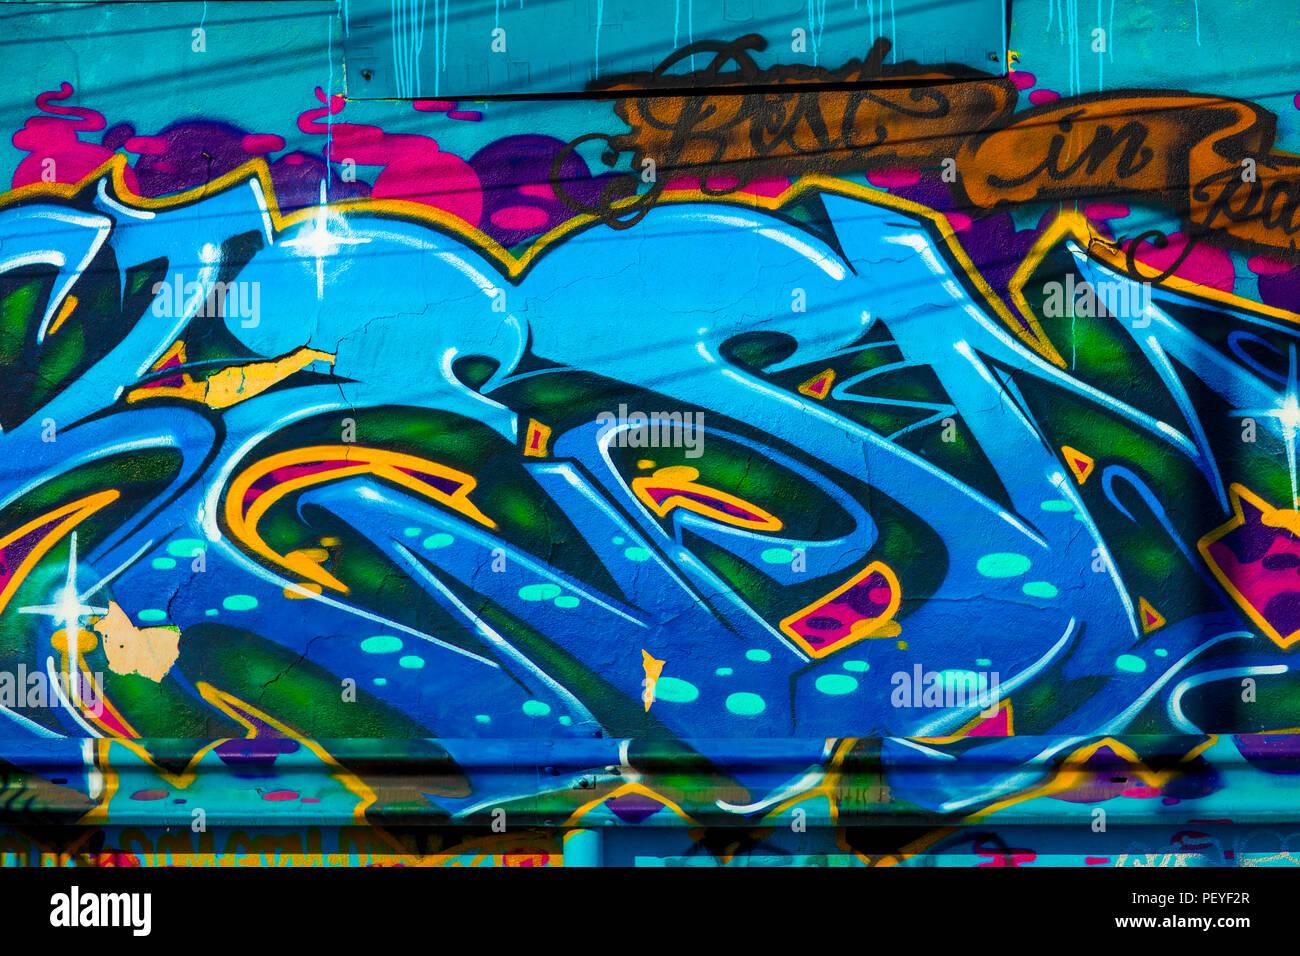 Fresh Graffiti - Stock Image